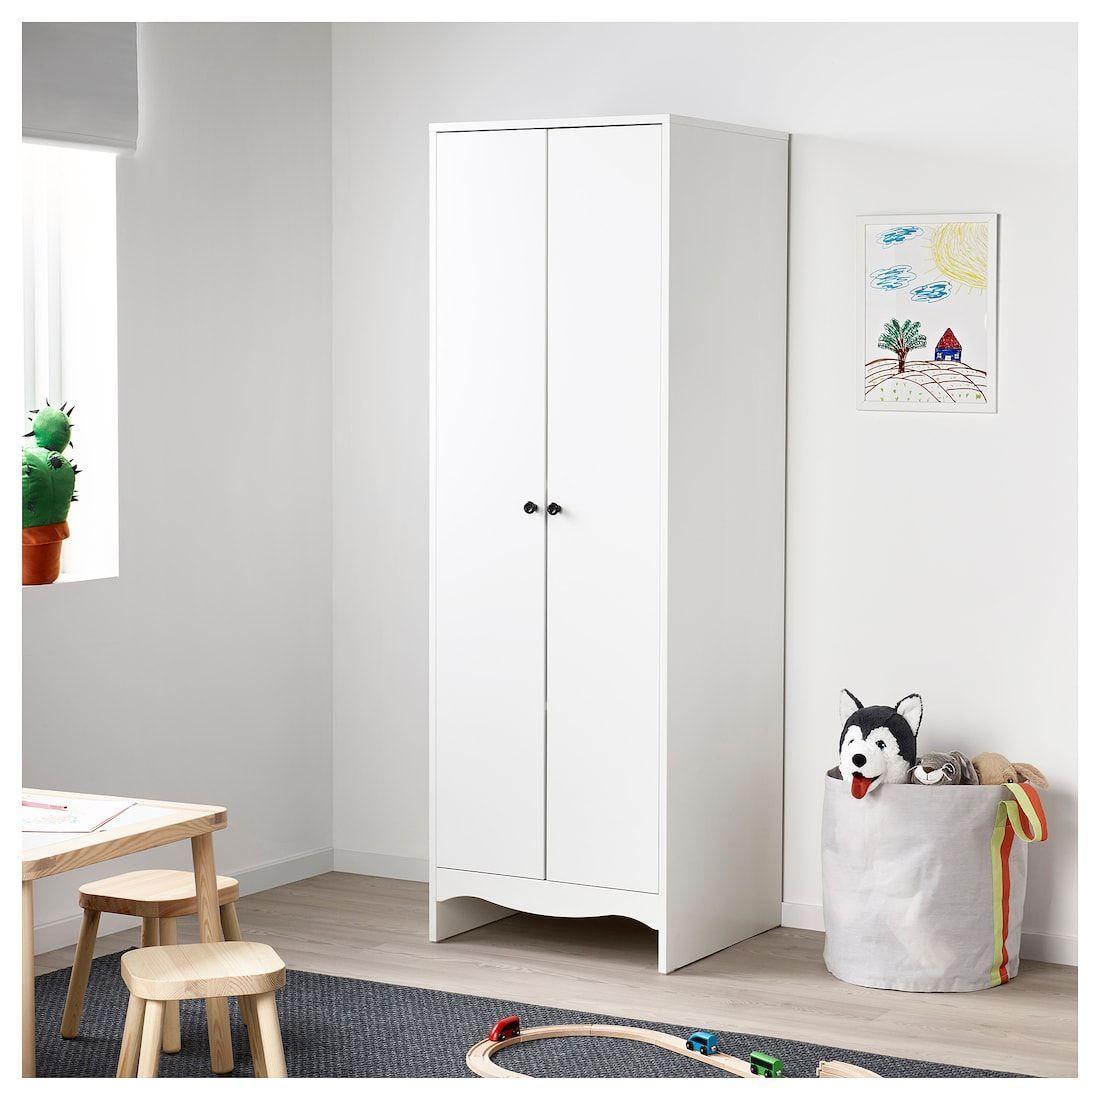 Ikea Solgul Wardrobe White Solgul Wardrobe White Ikea In